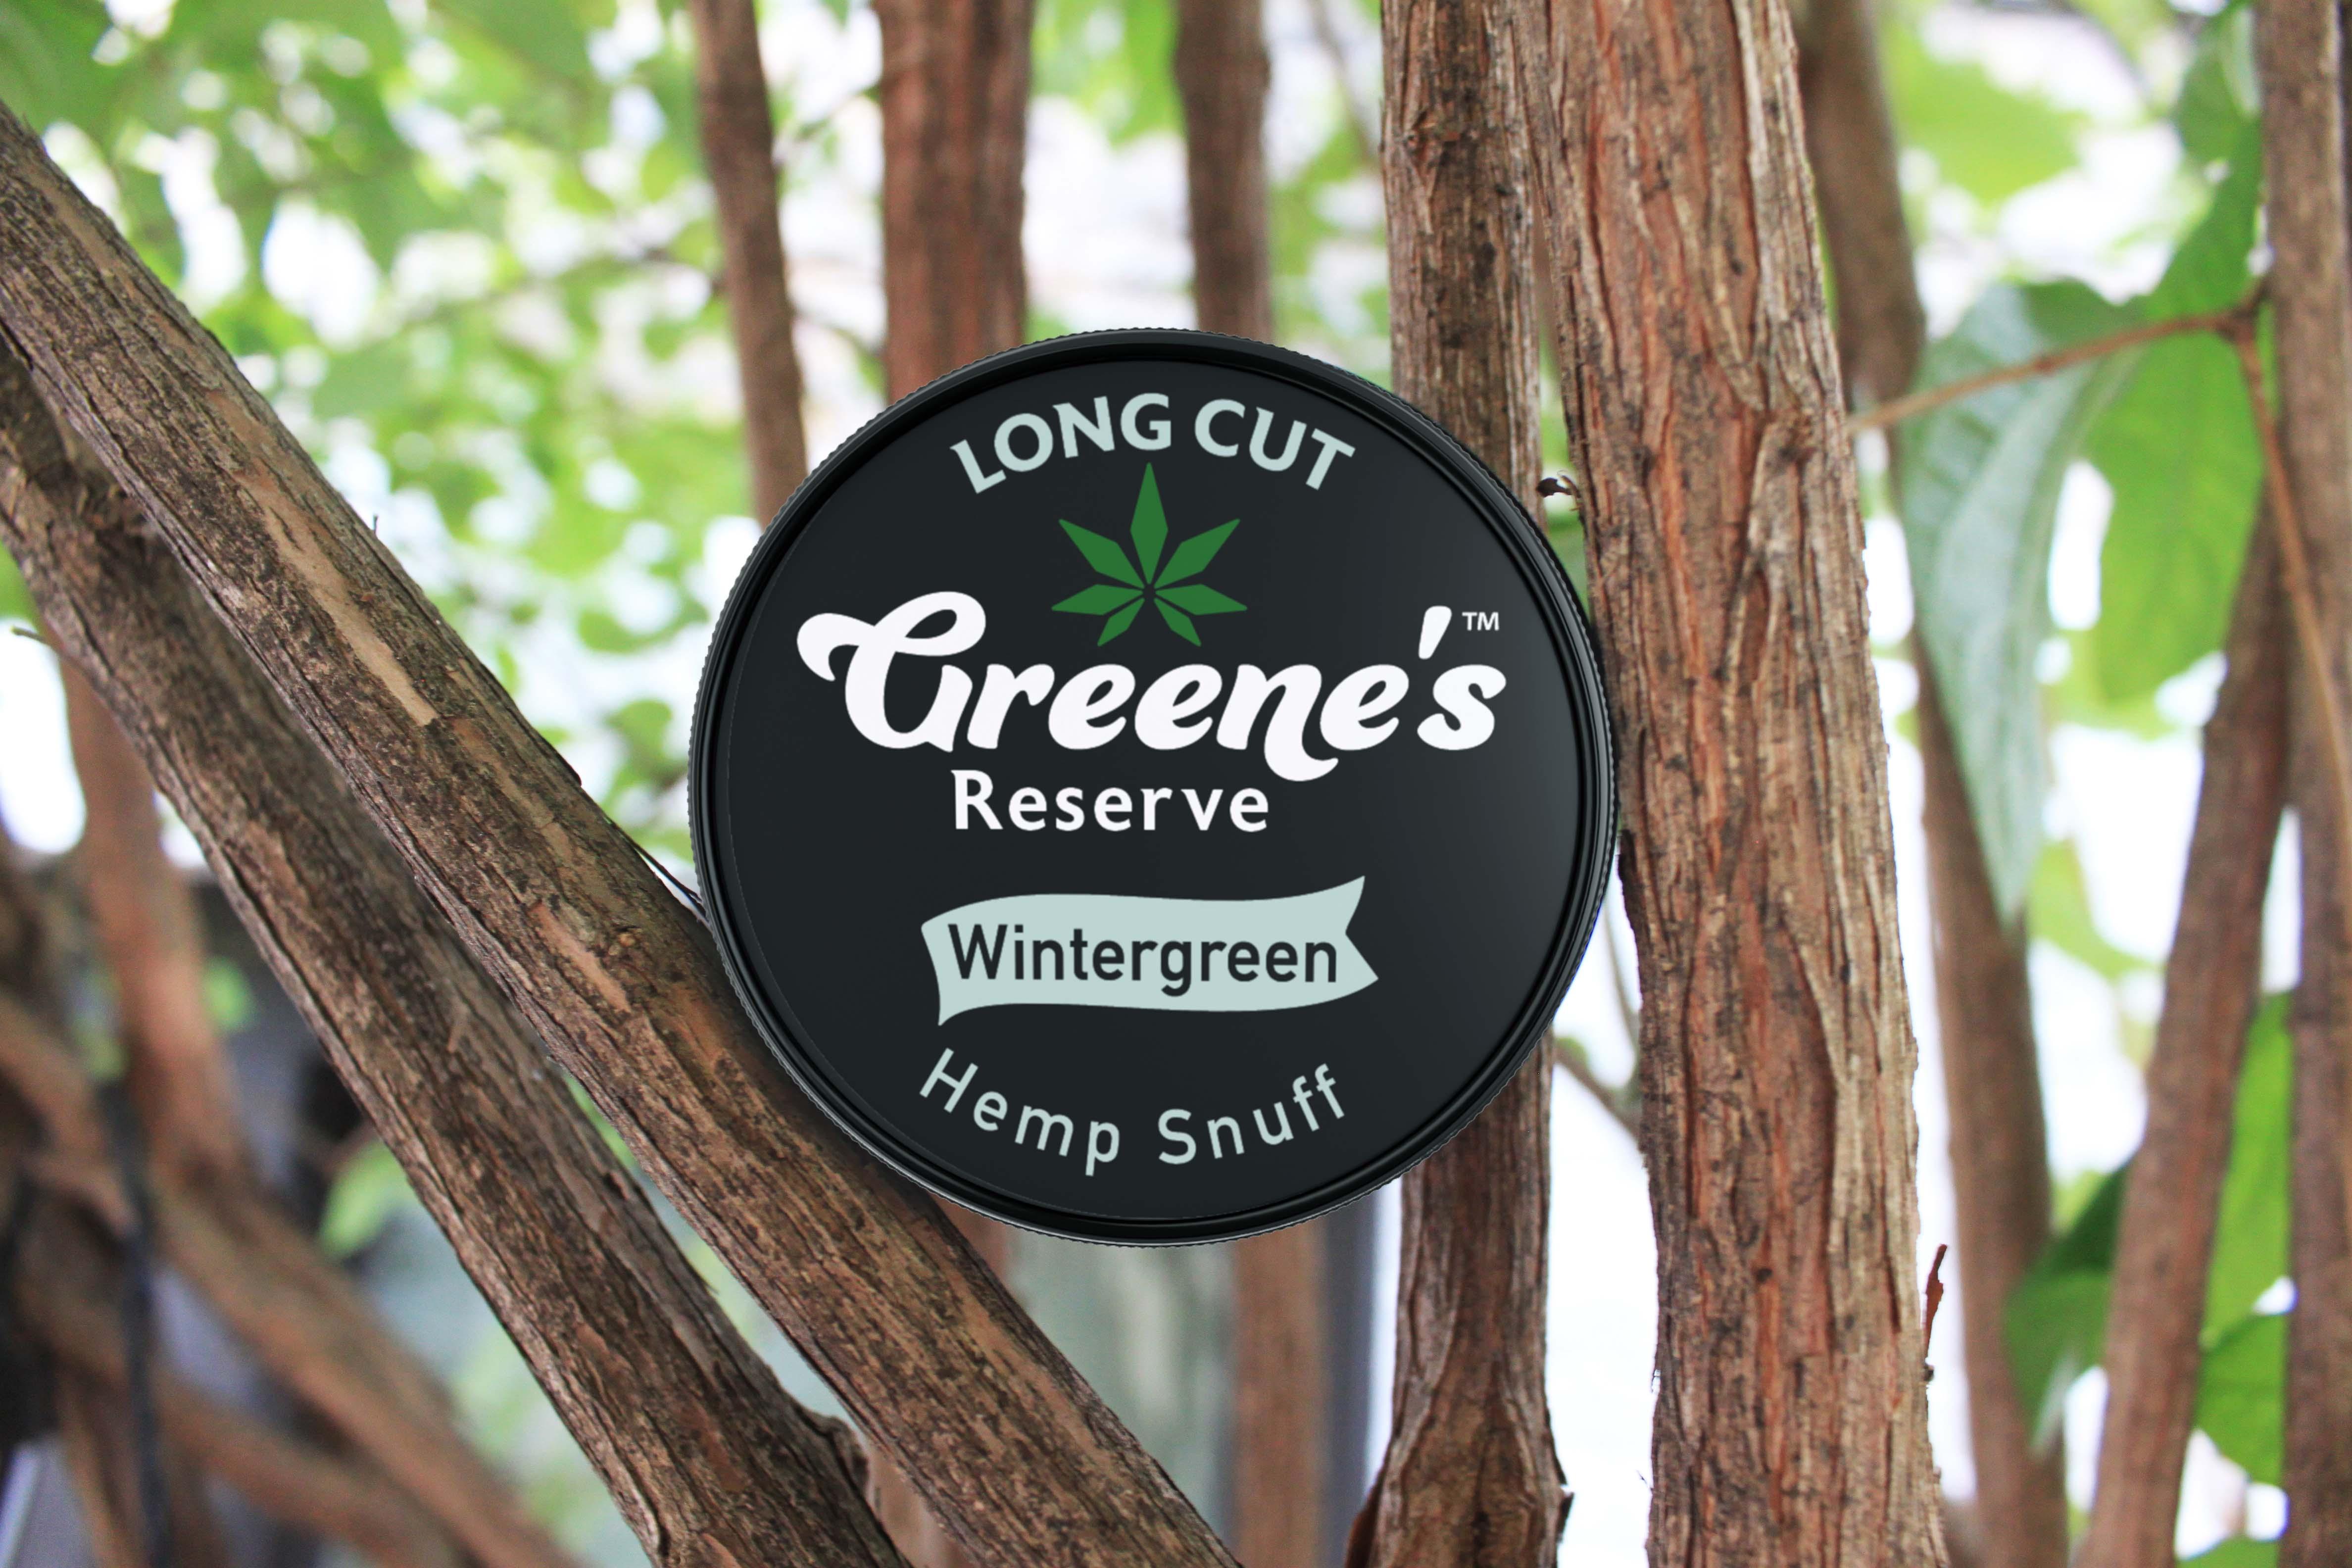 Greene's Reserve Wintergreen